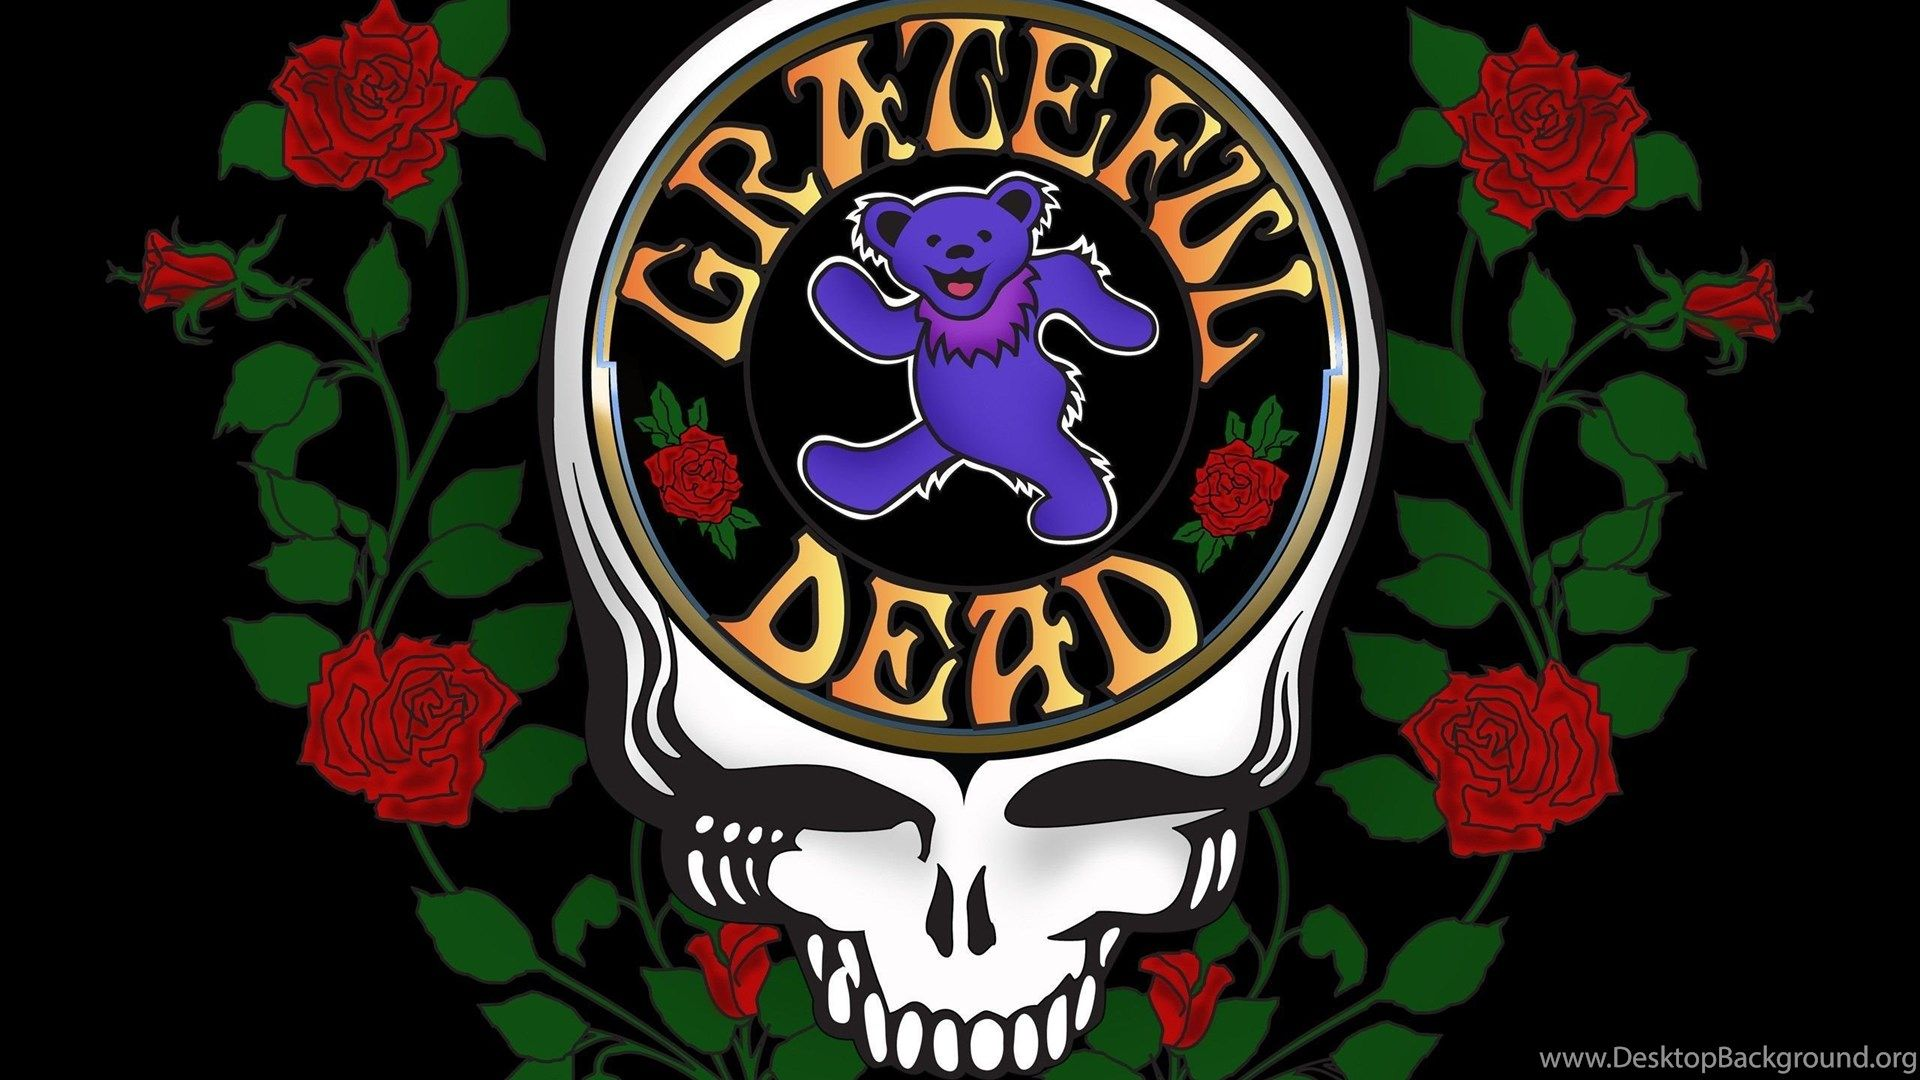 Grateful Dead wallpaper theme